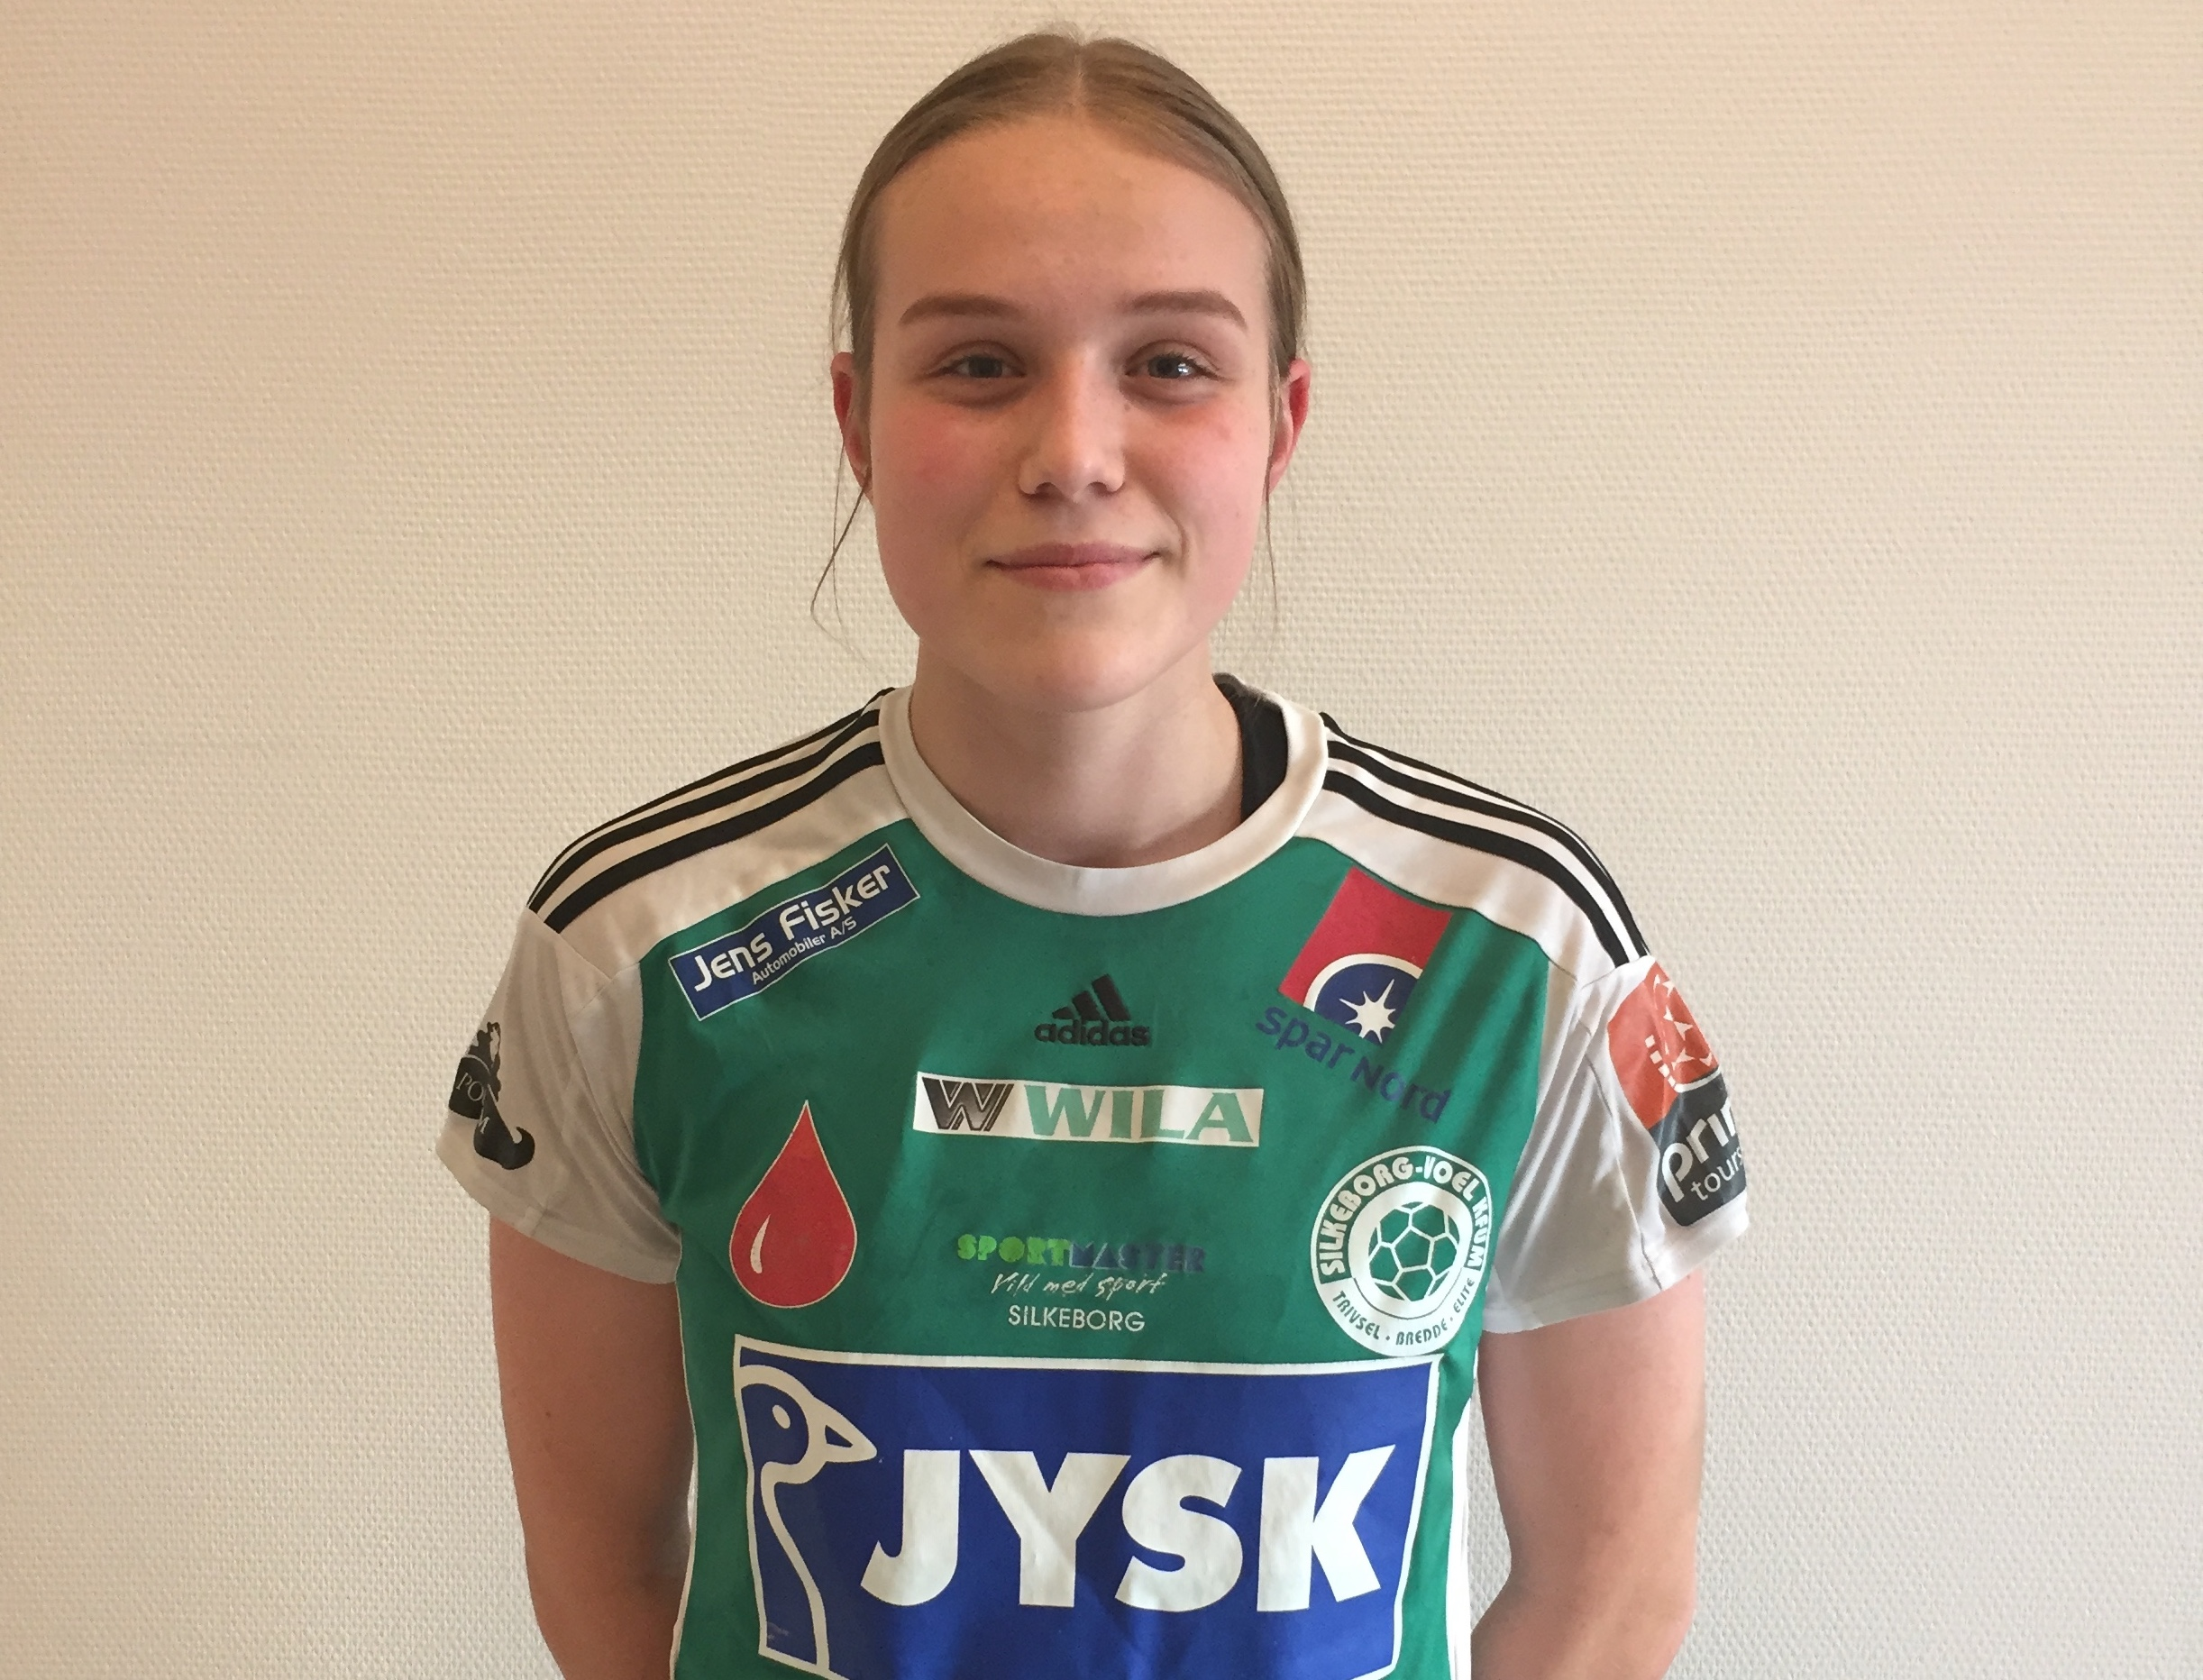 Emma Laursen